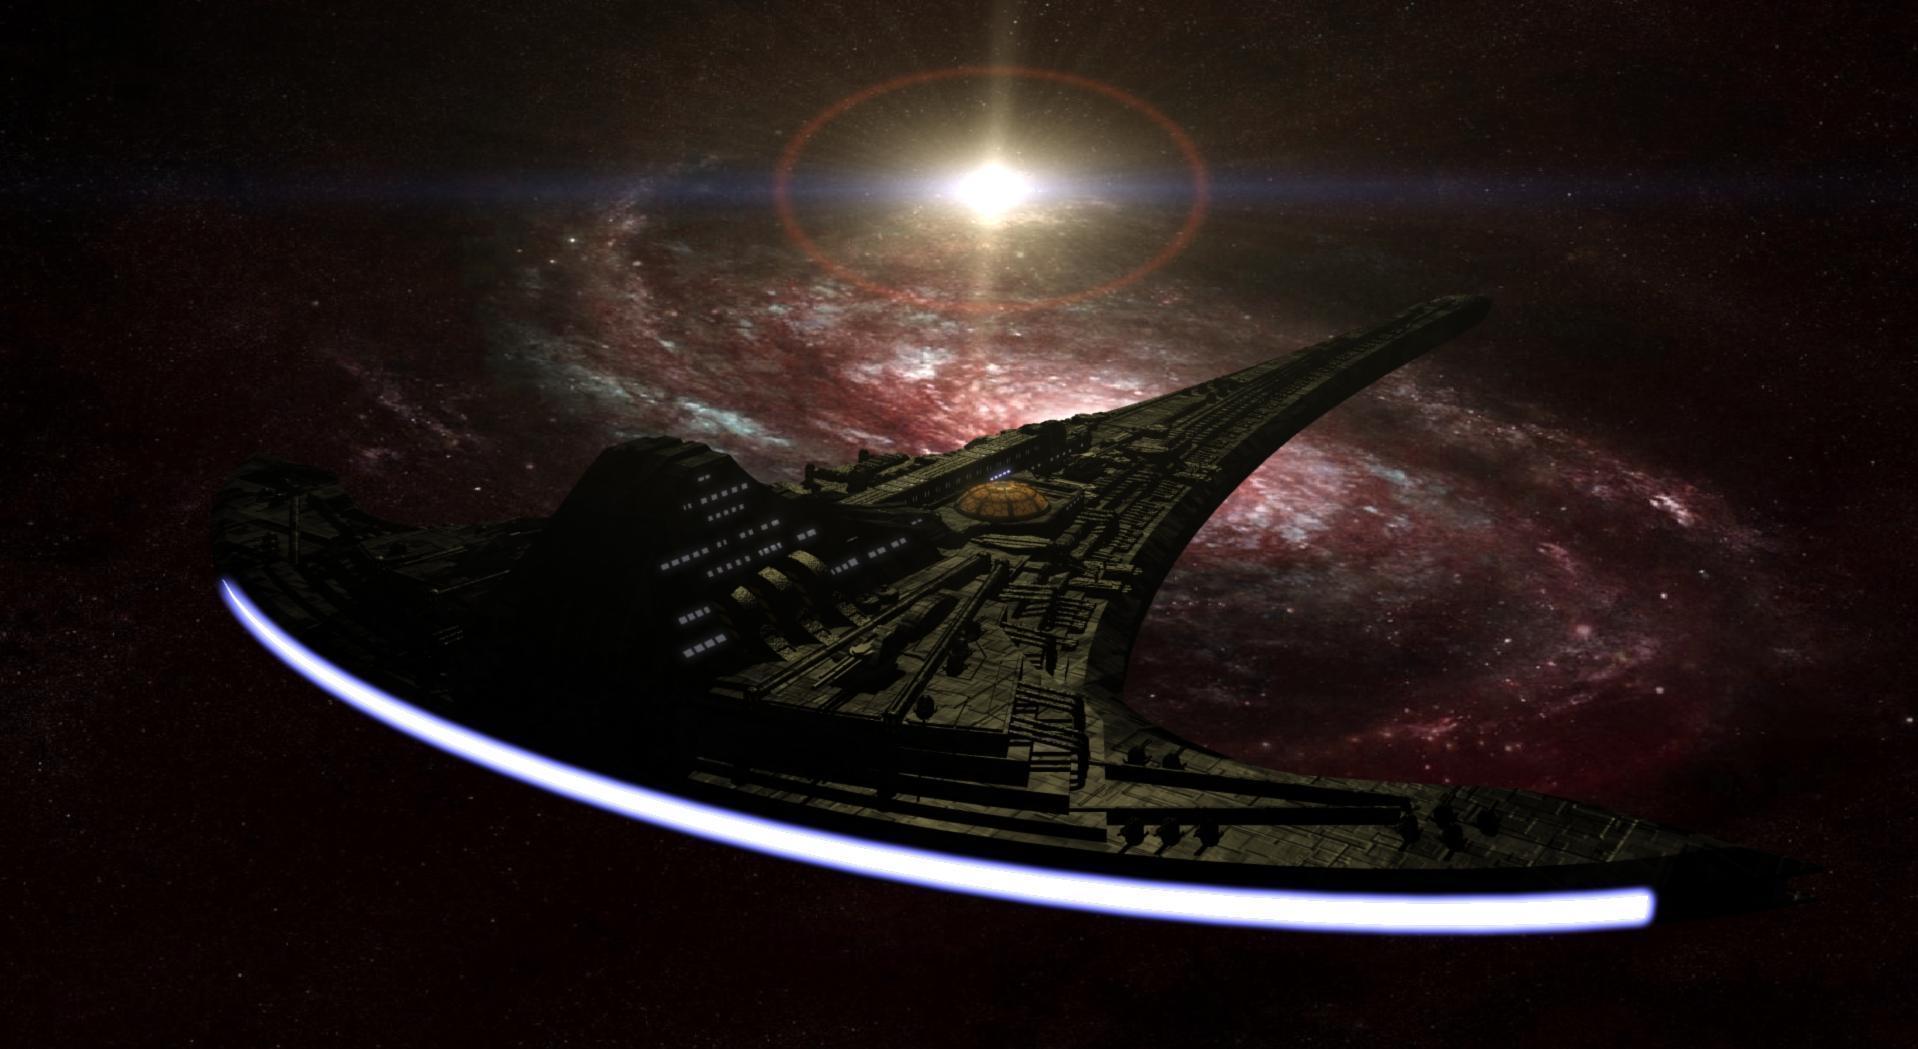 stargate wallpaper universe space - photo #20